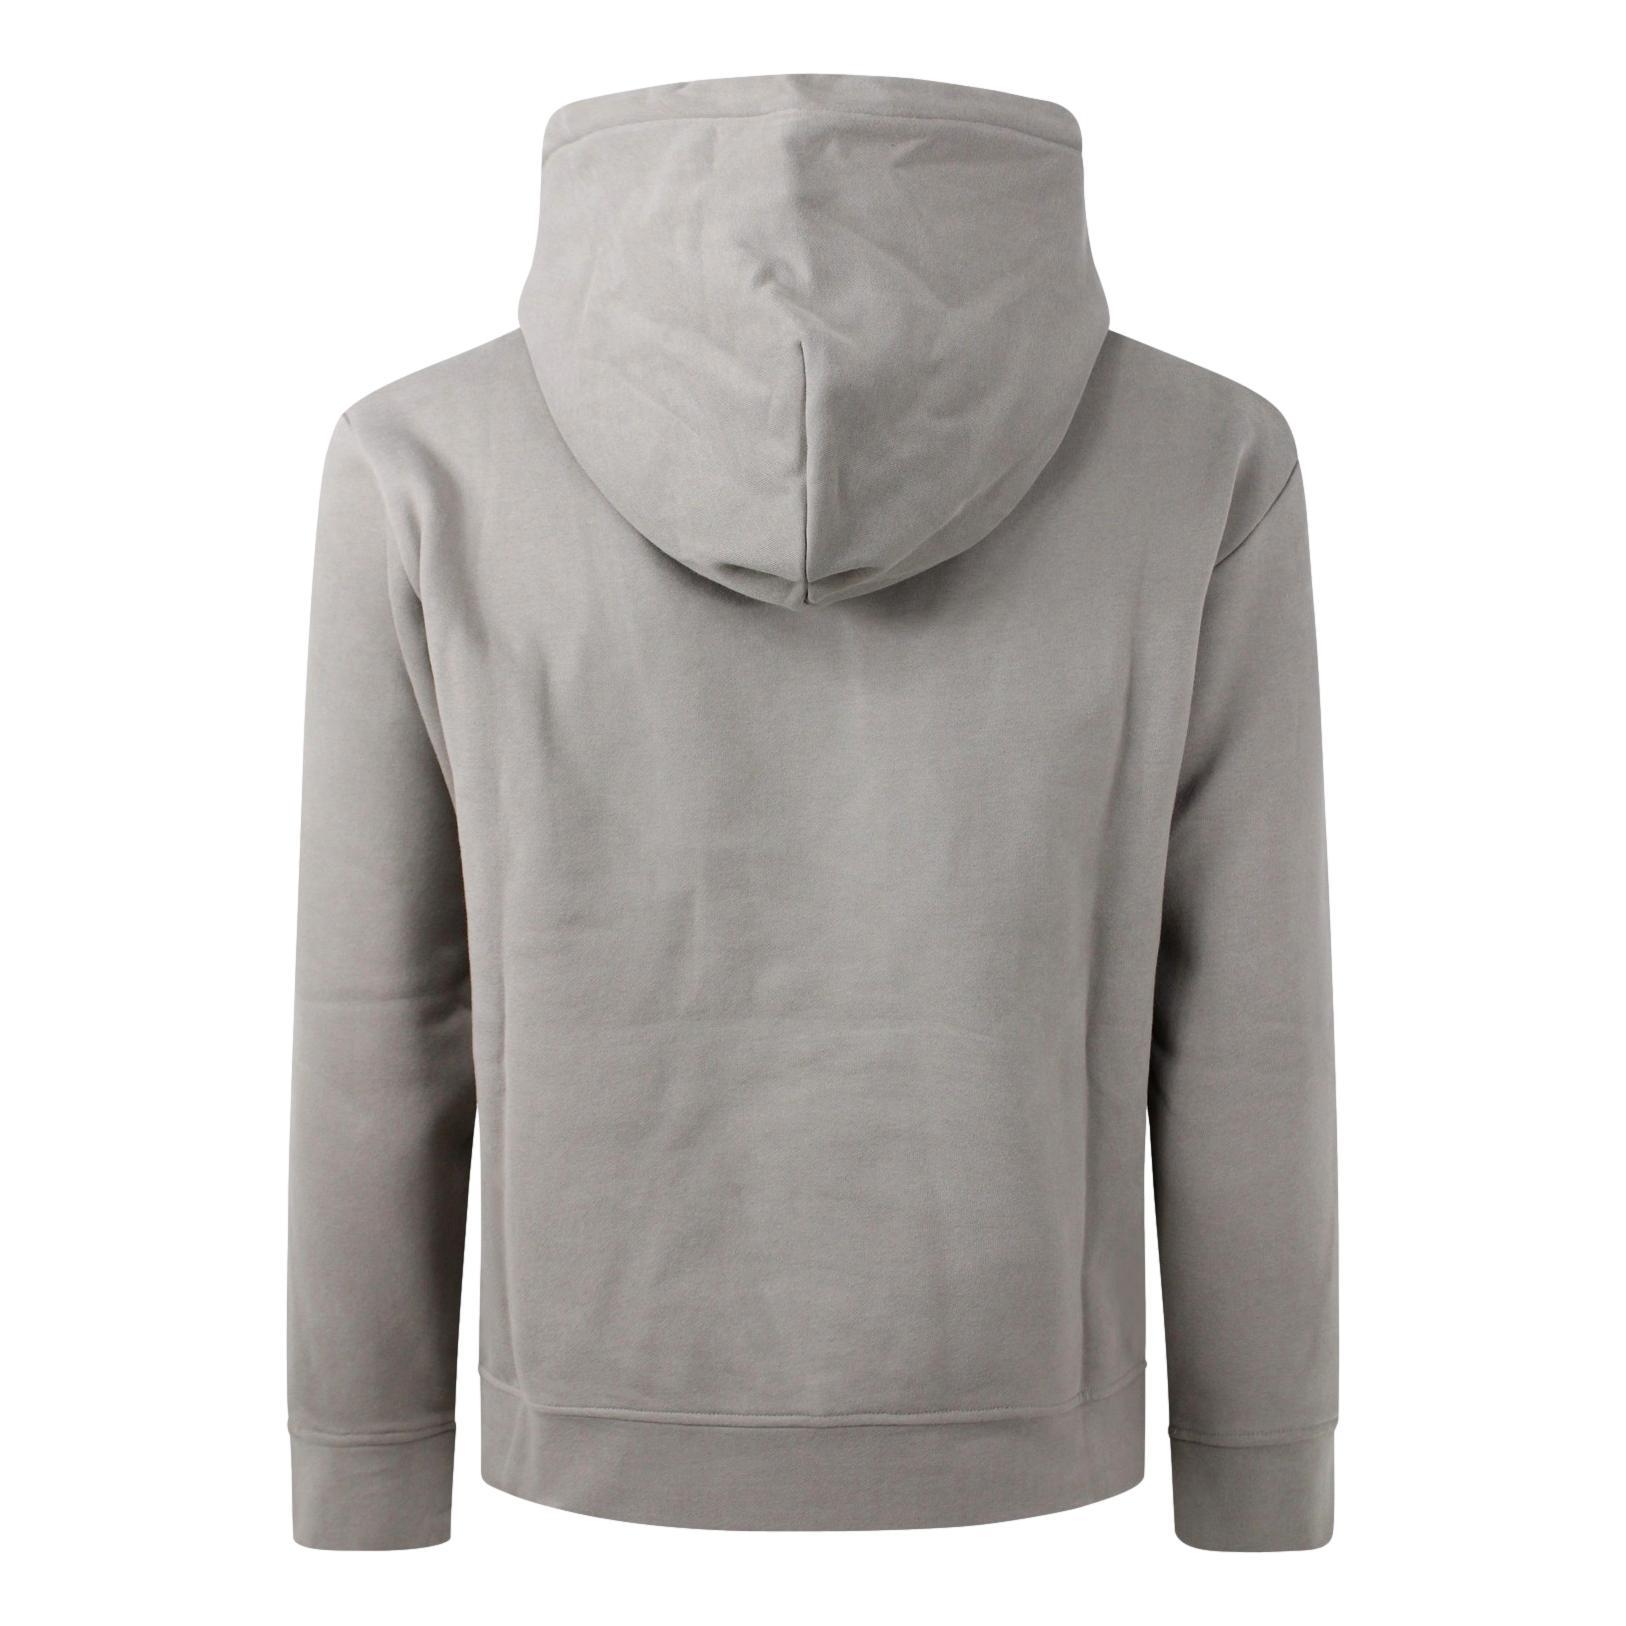 Gray hooded sweatshirt for men EMPORIO ARMANI |  | 6K1M92 1JQKZ0110